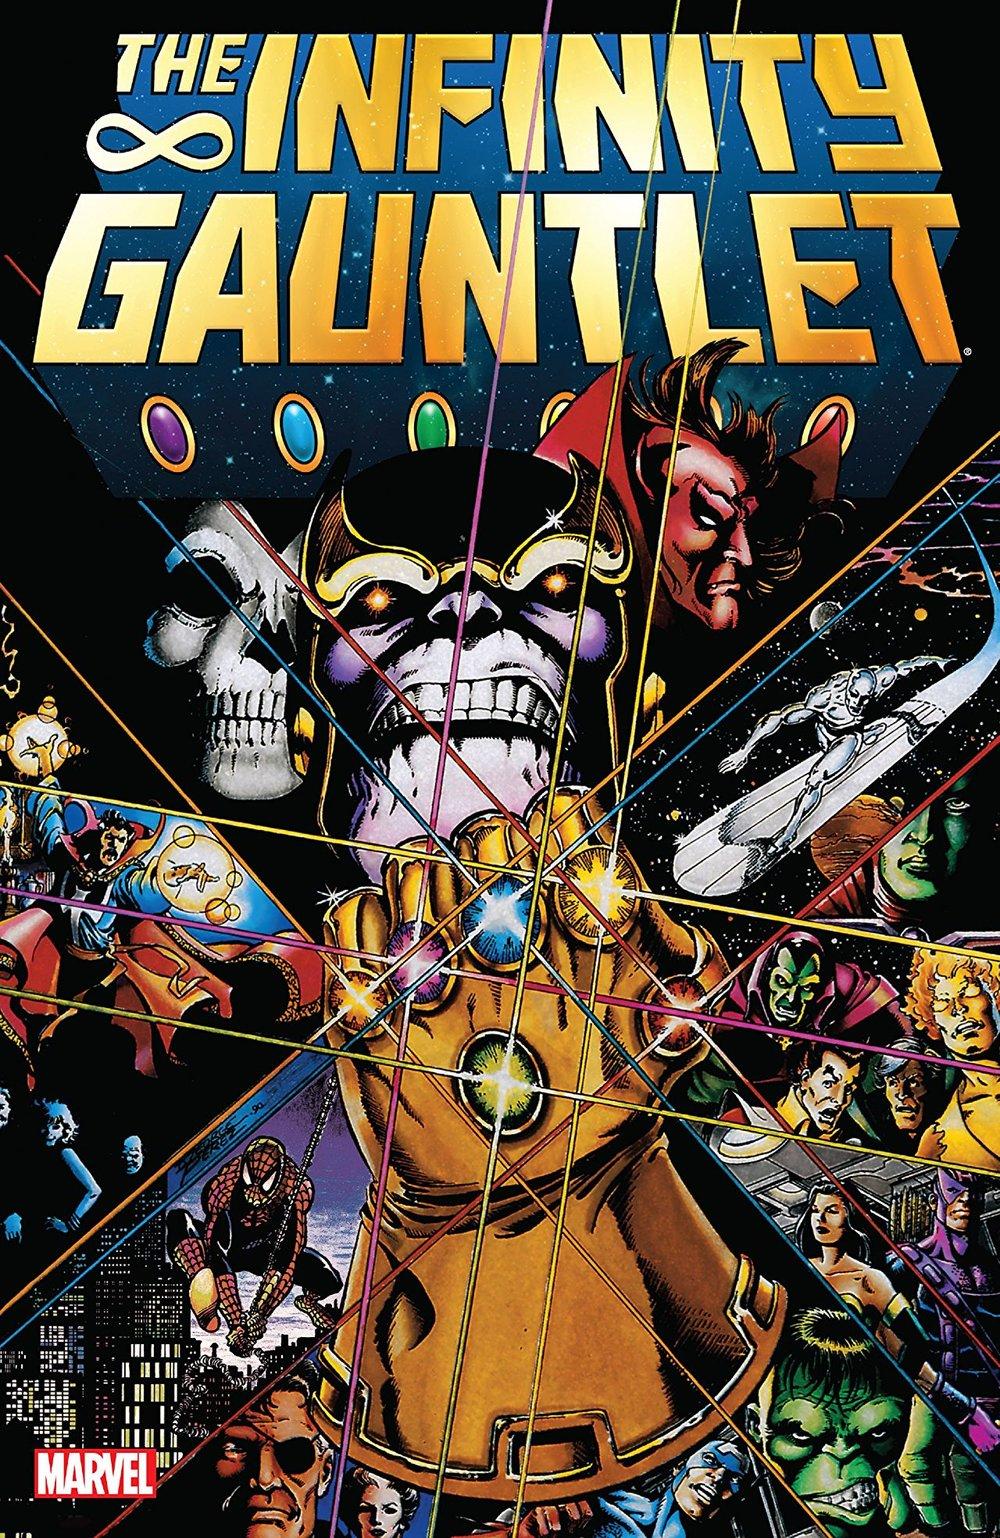 Characters in Avengers - Iron ManHulkBlack WidowLokiThorHawkeyeStar-LordScarlet WitchDr. StrangeVisionThanosBlack PantherThe CollectorSpider-ManBlack PantherAnt-Man